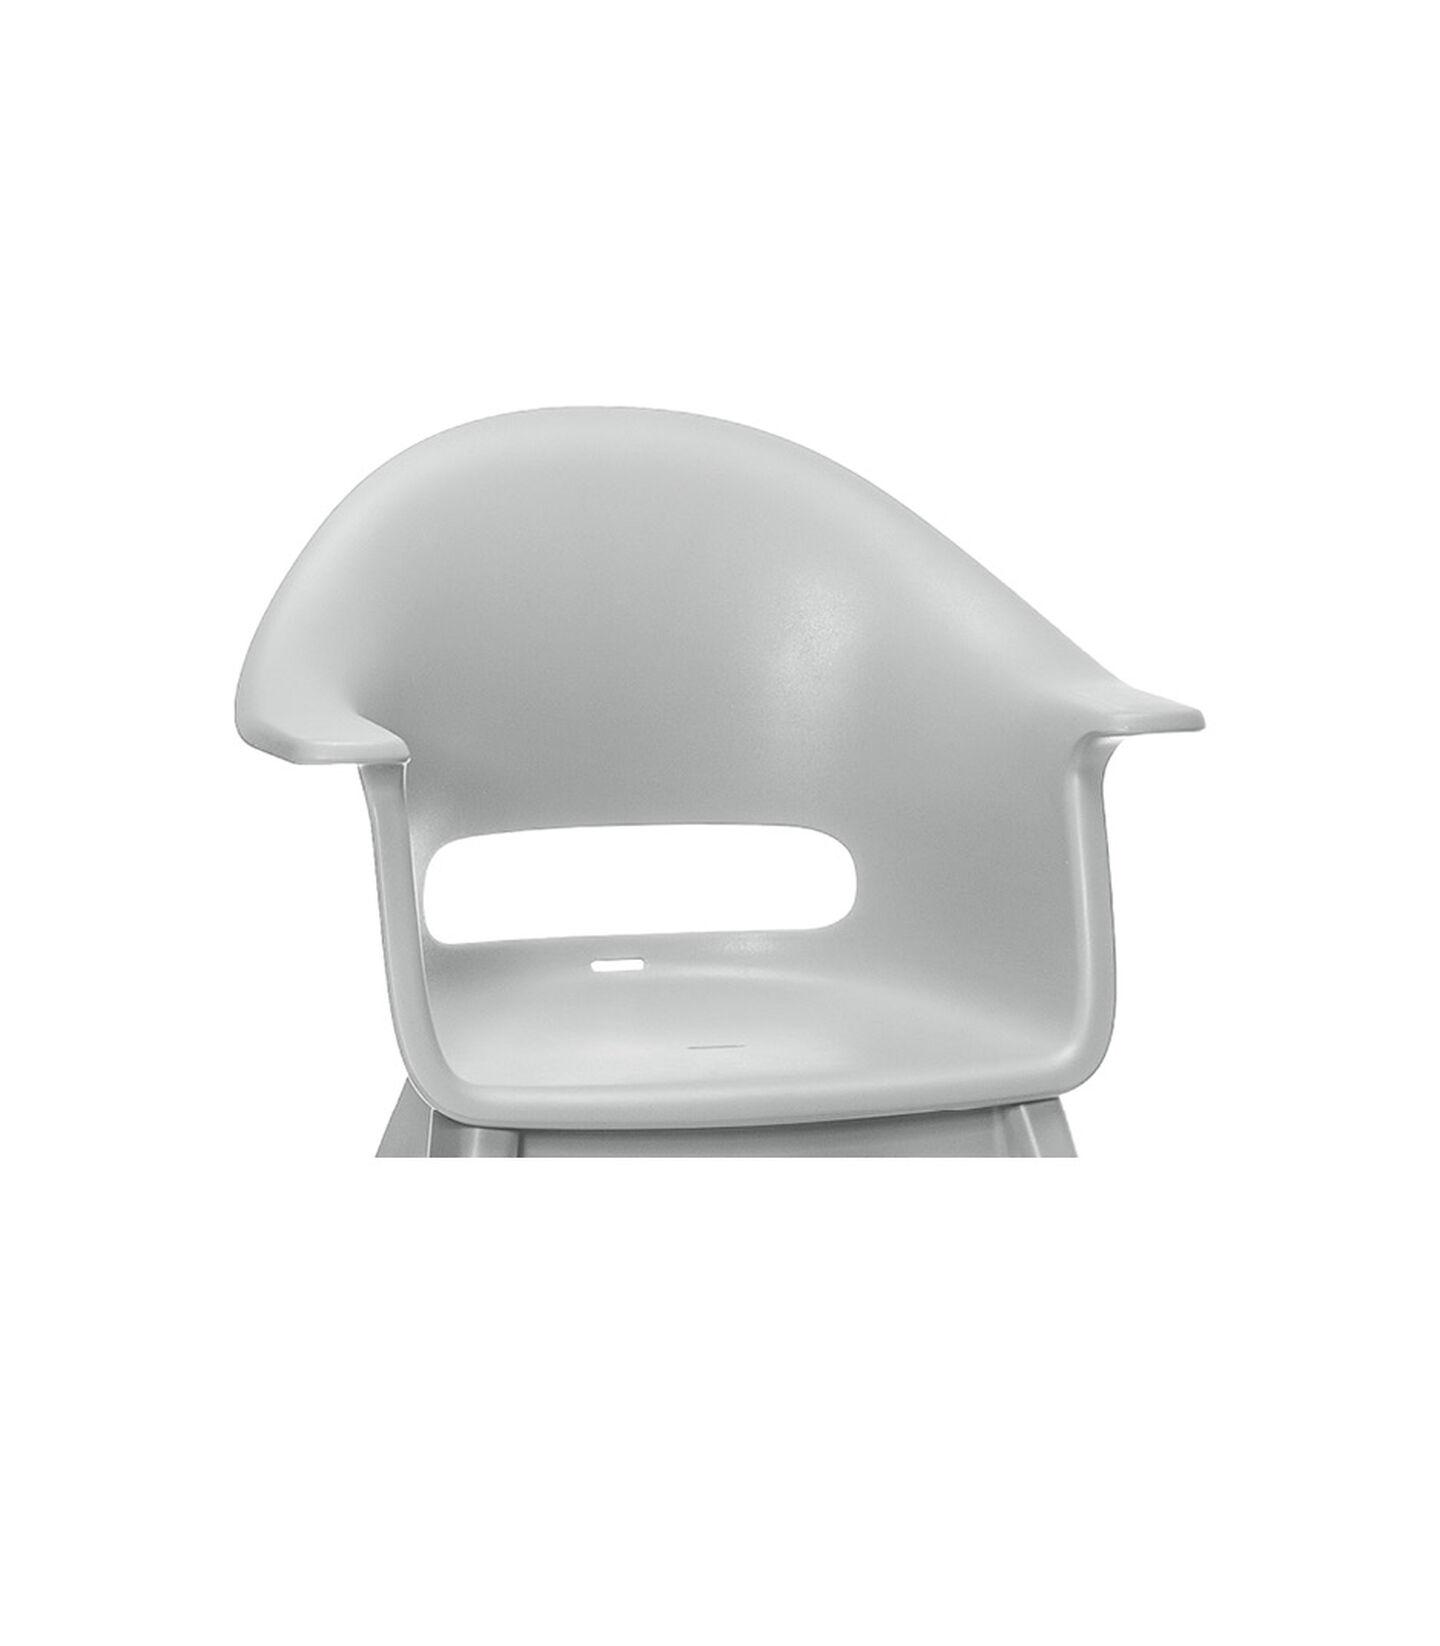 Stokke® Clikk™ Sitz - Cloud Grey, Cloud Grey, mainview view 2